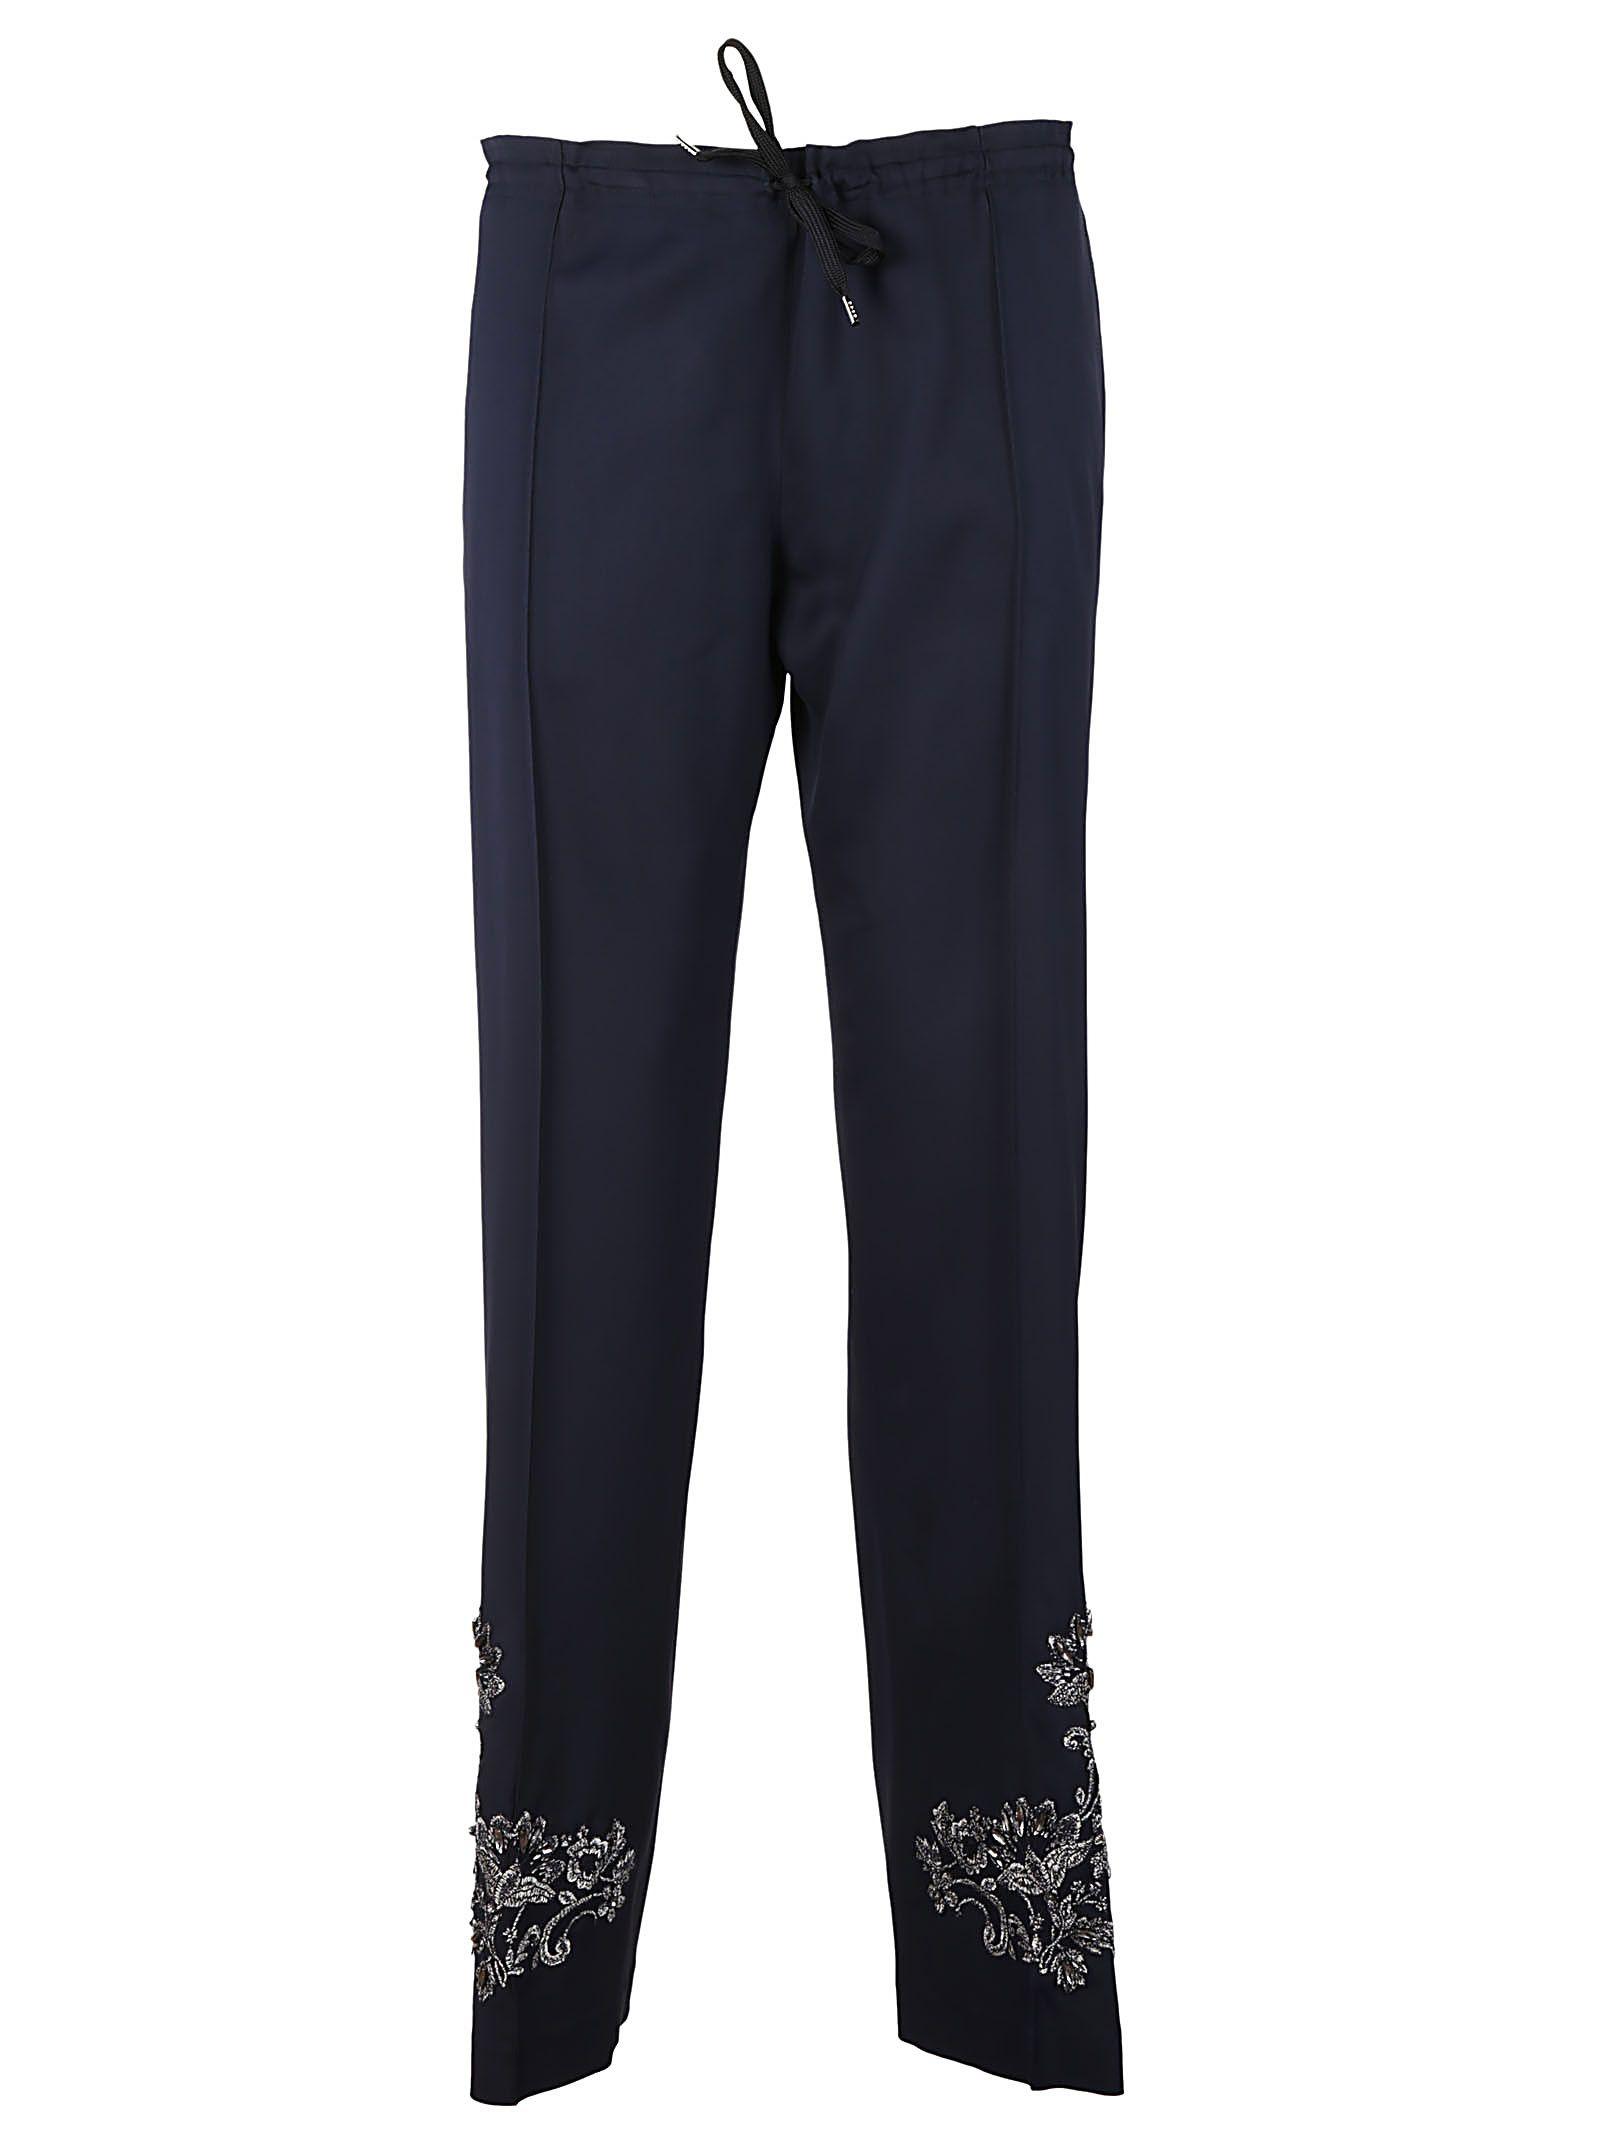 Ermanno Scervino Embroidered Trousers